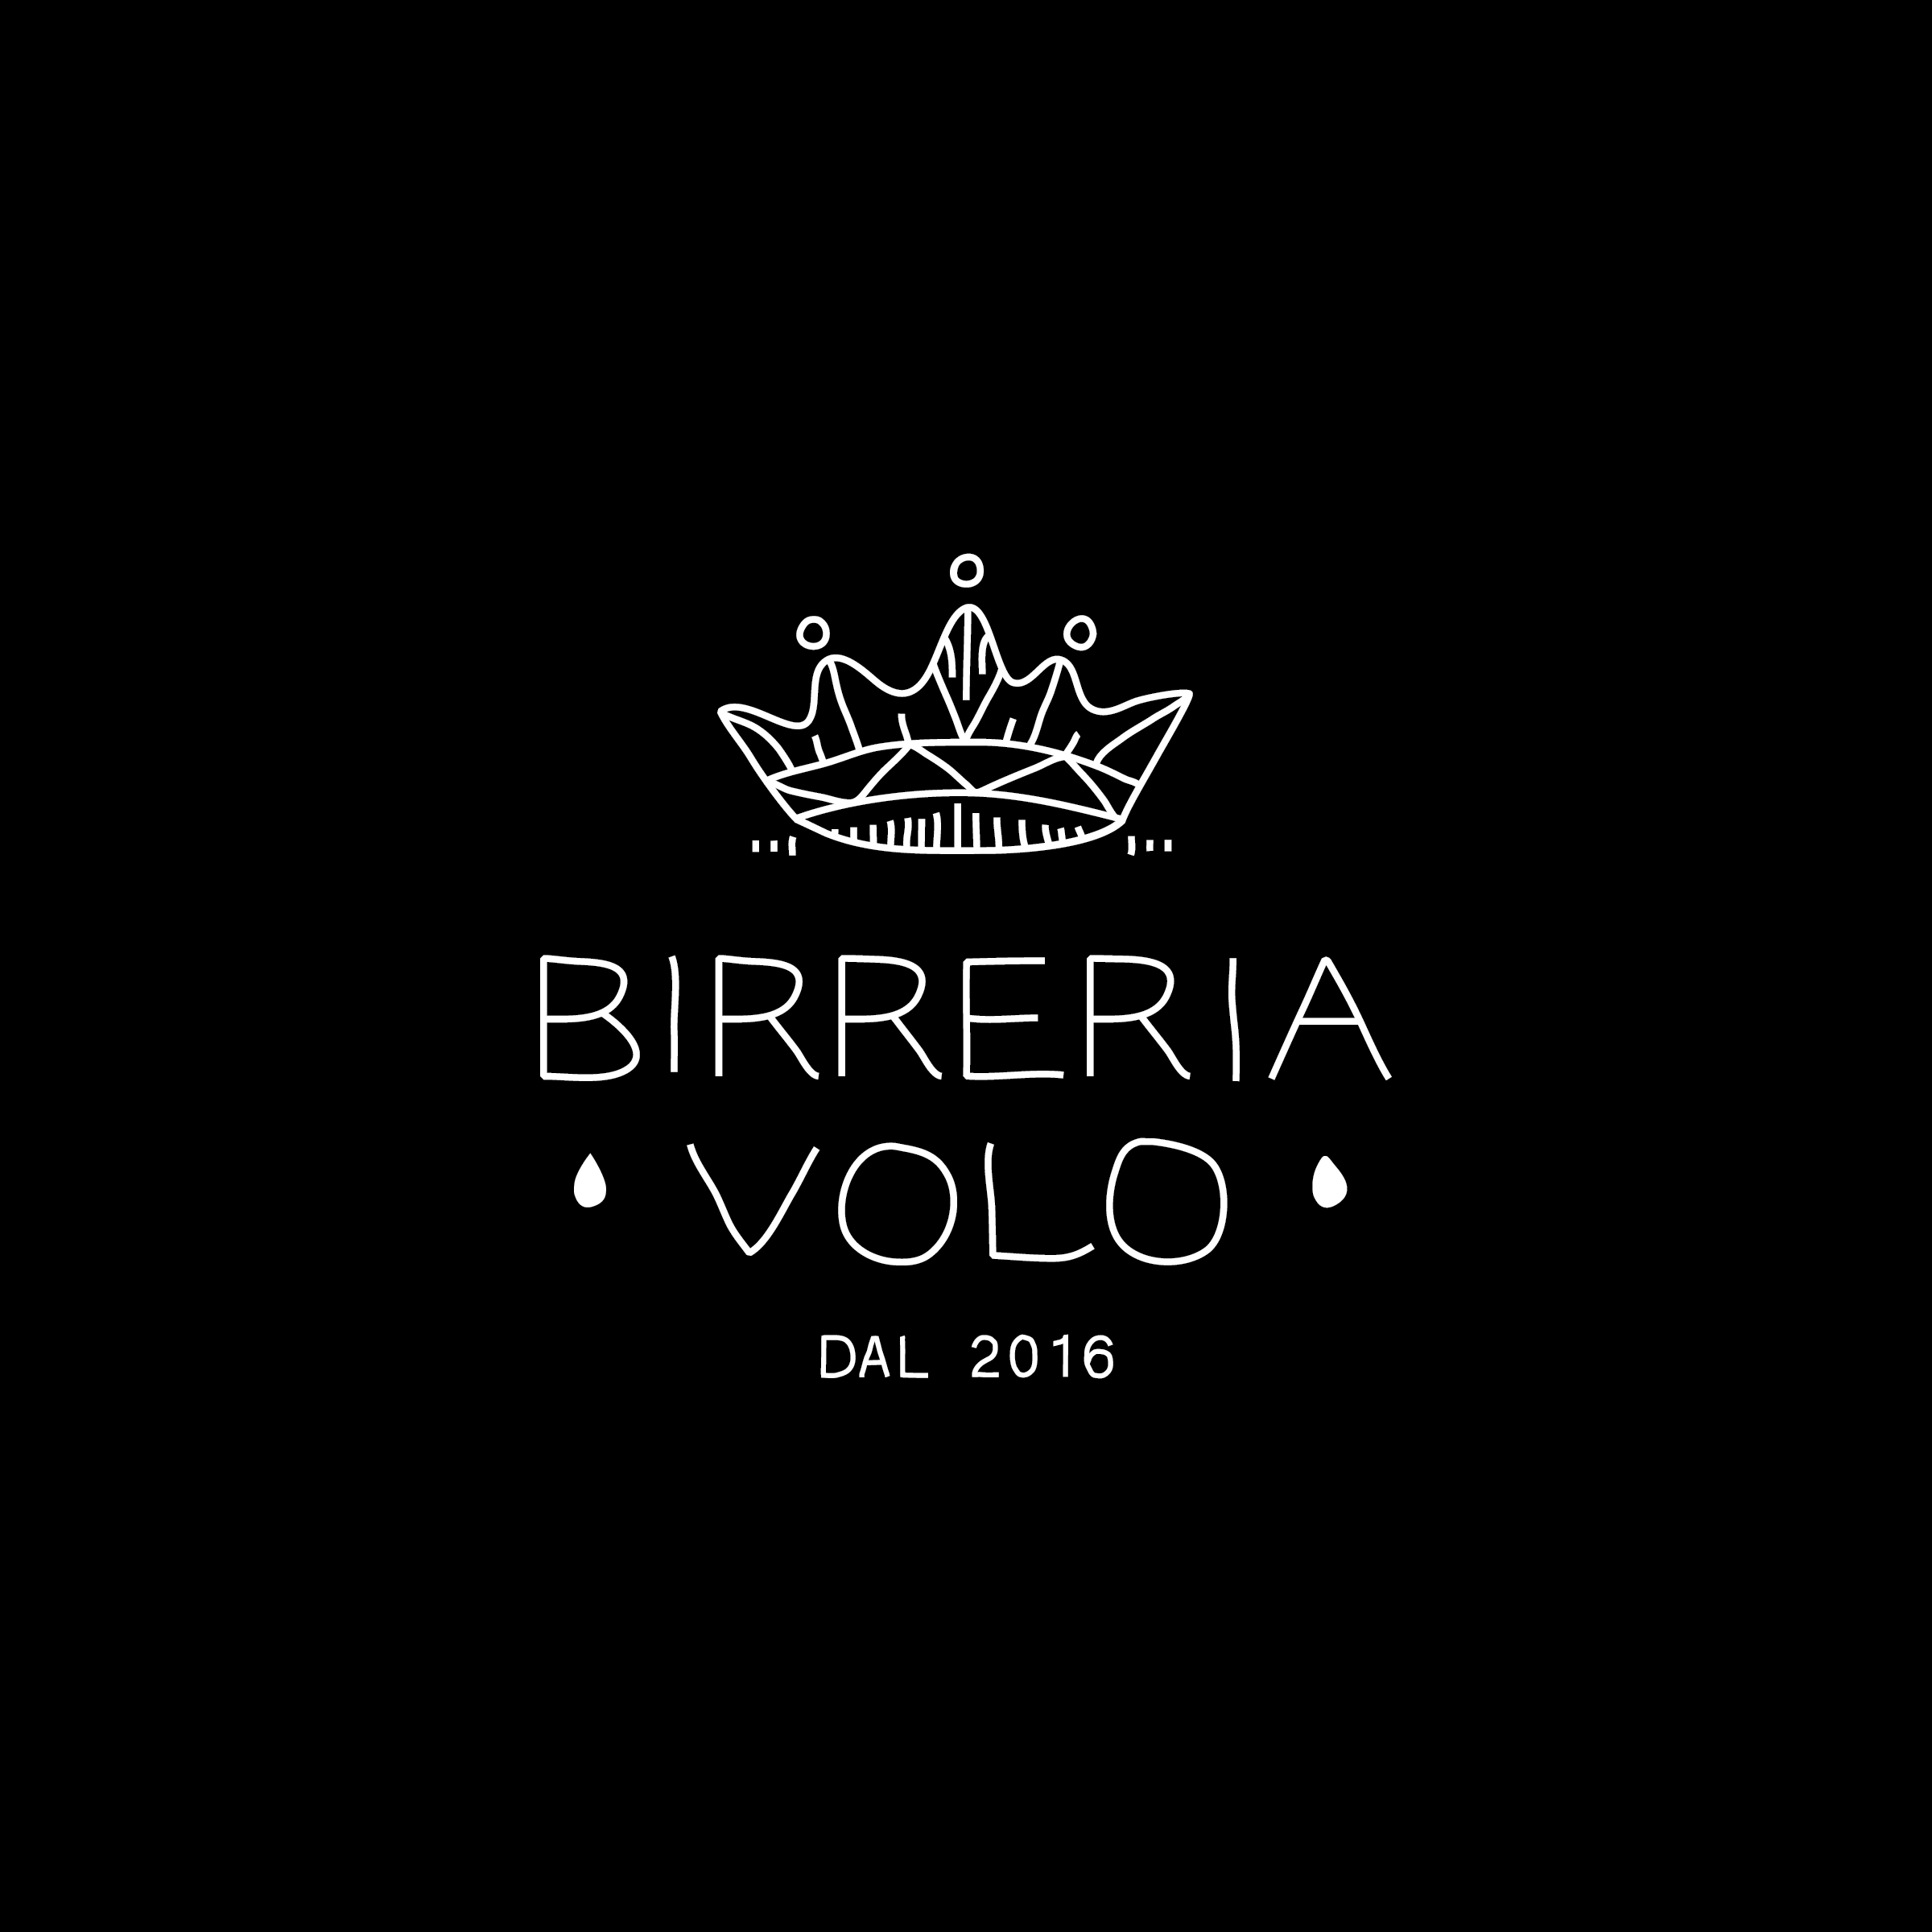 BIRRERIA_VOLO_FINAL_ASSETSai-02.jpg